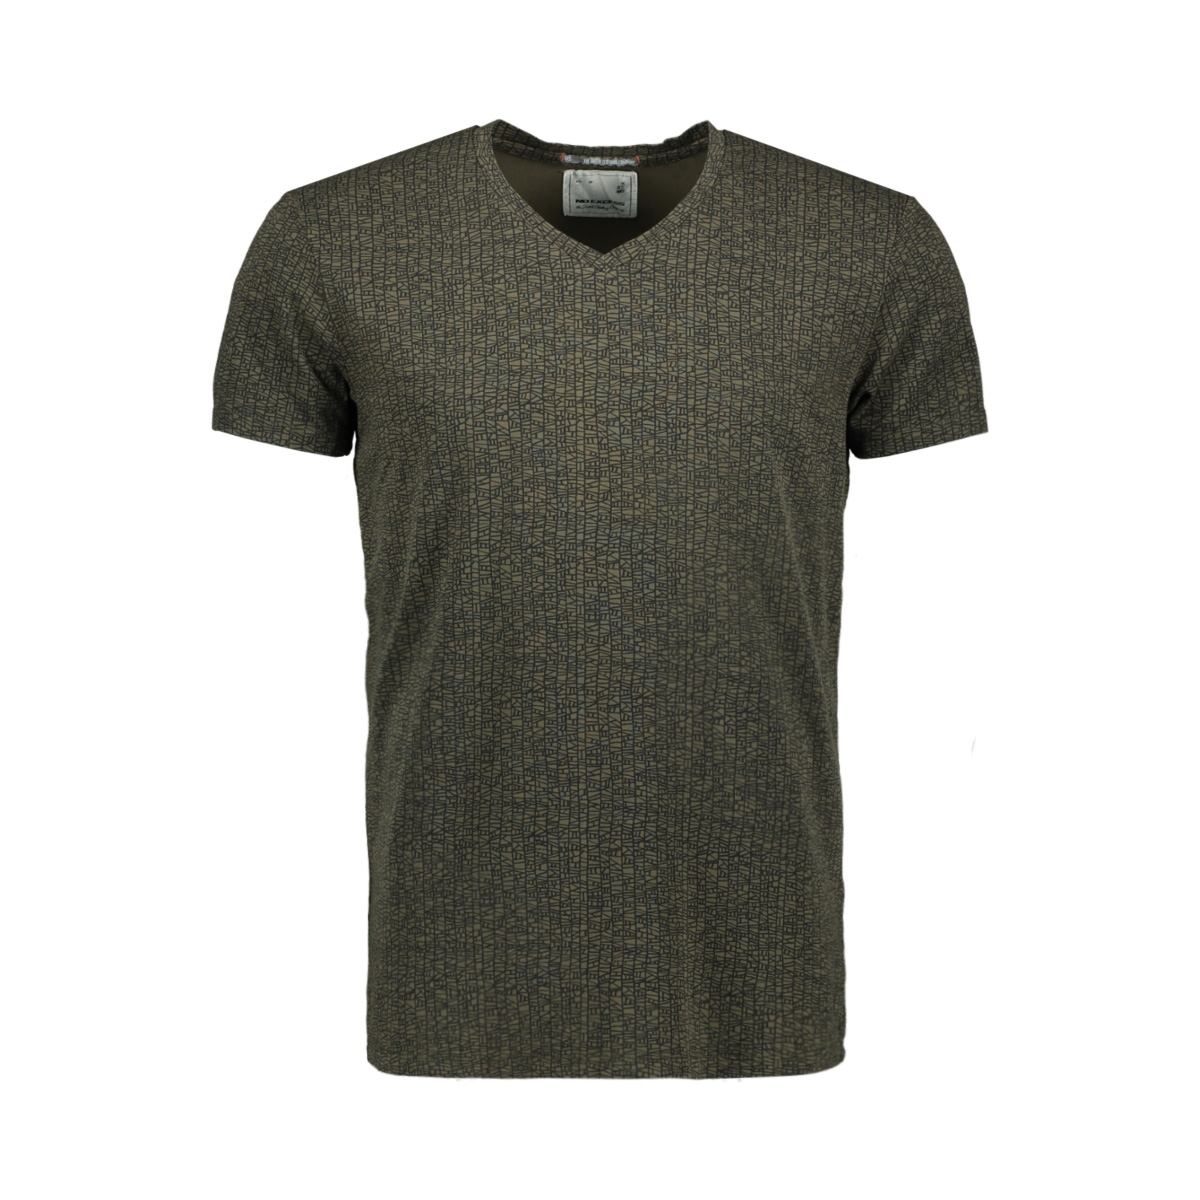 t shirt 90320308 no-excess t-shirt 059 dk army